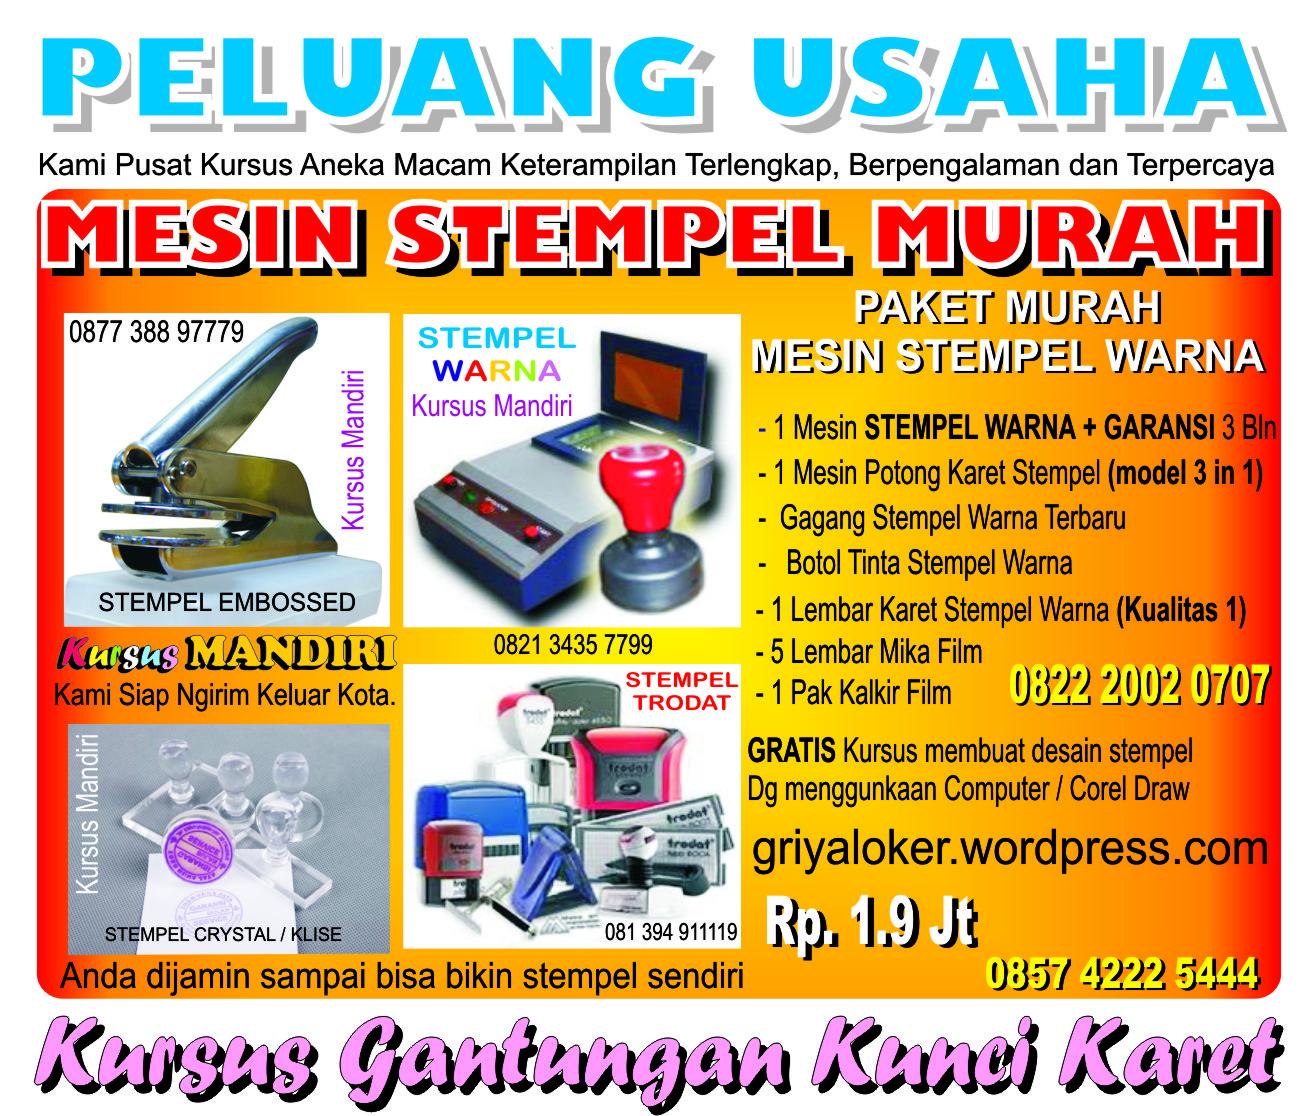 Toko Baja Ringan Kudus Percetakan, Sablon, Sparasi, Digital Printing, Dll: Http ...